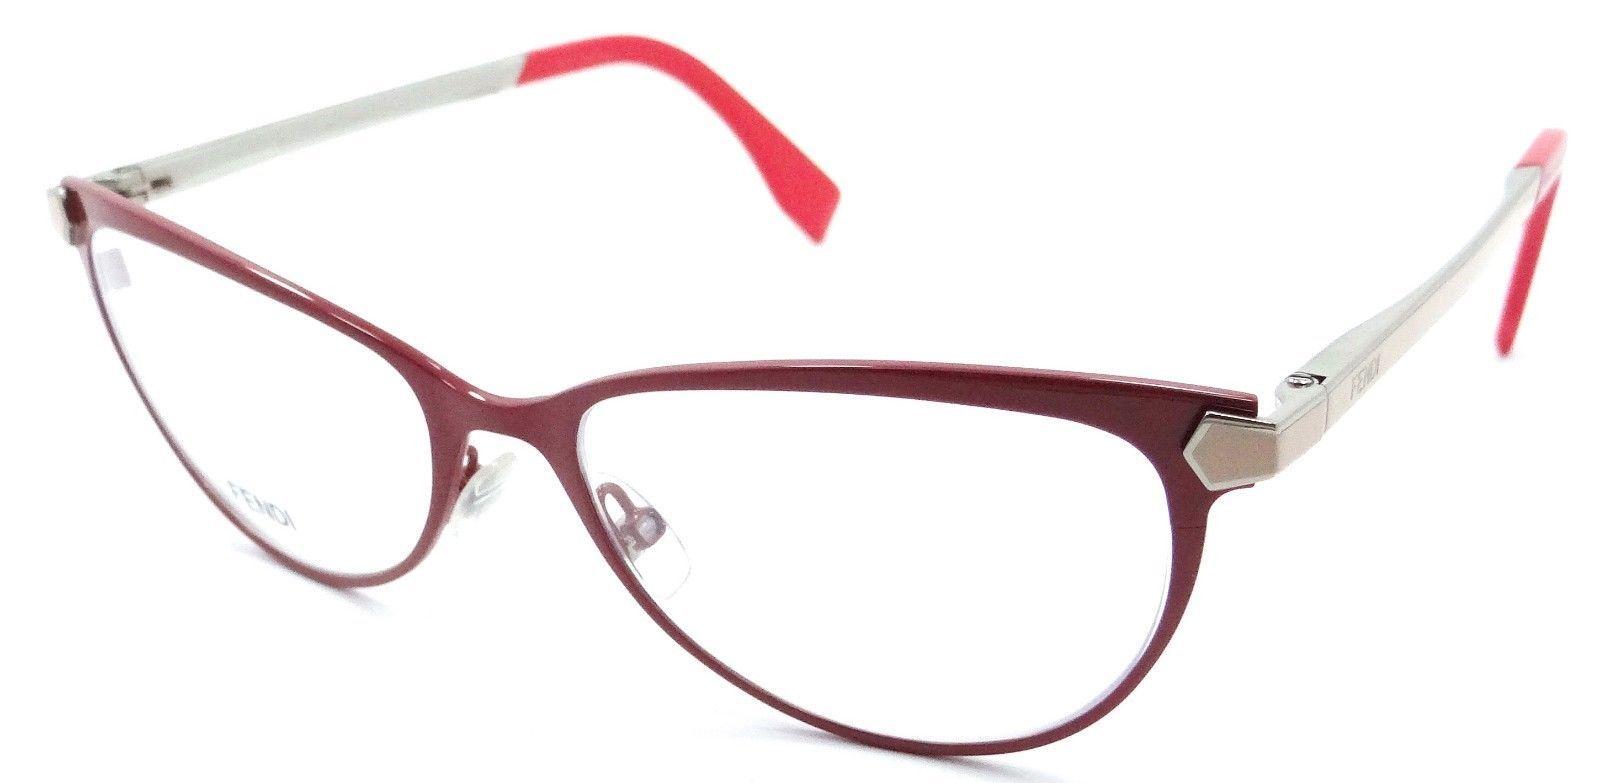 440526b7ec9 Fendi Rx Eyeglasses Frames FF 0024 7VZ and 50 similar items